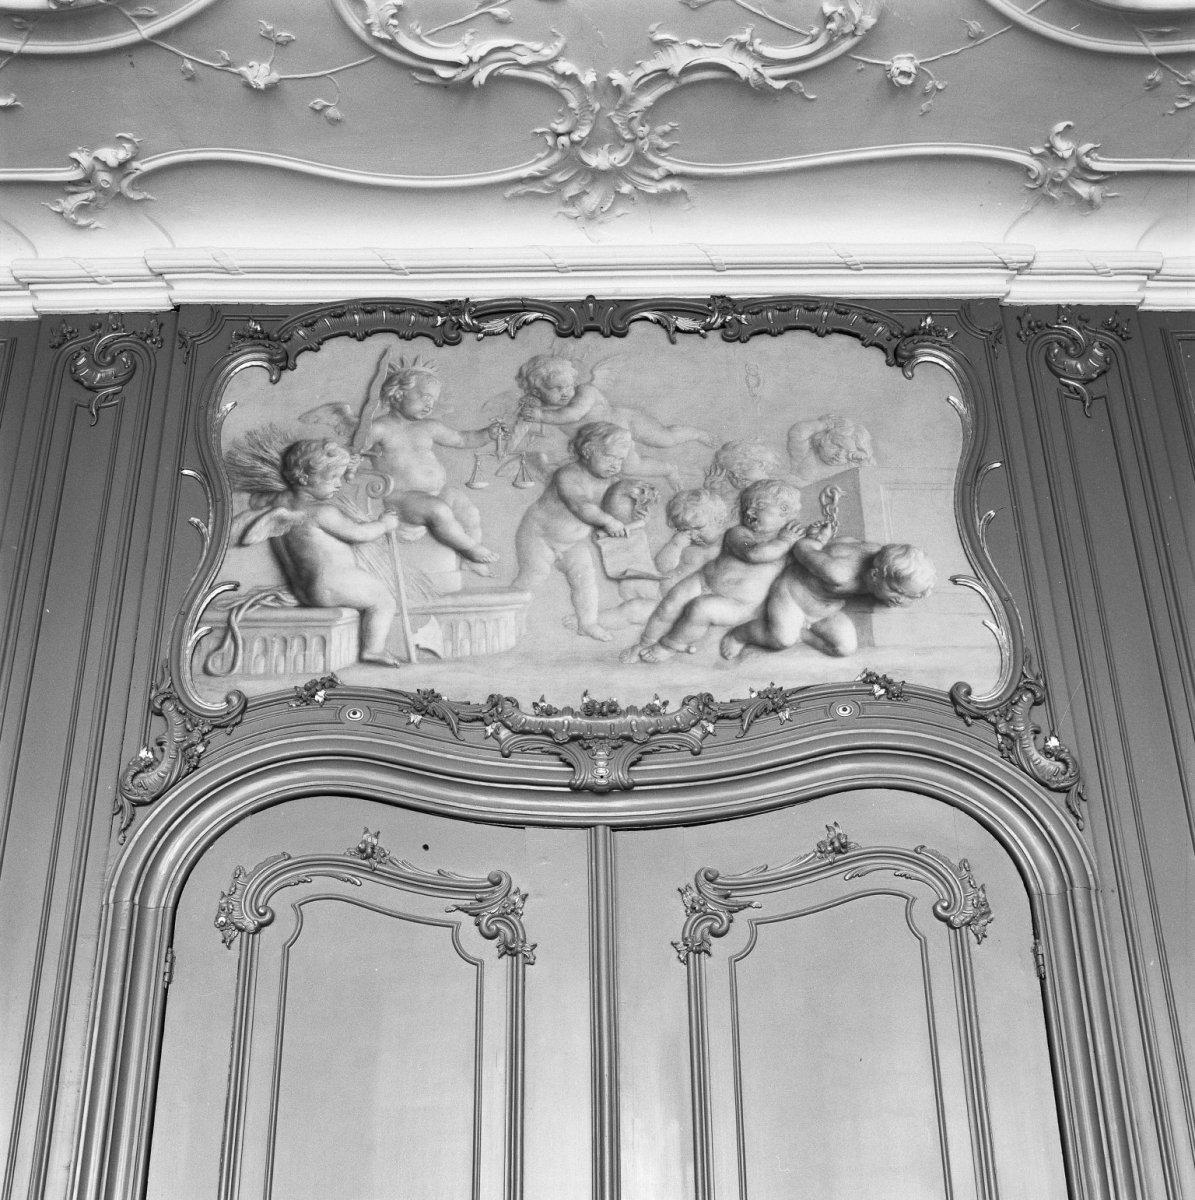 file interieur vierschaar dessus de porte grisaille schildering goes 20283522. Black Bedroom Furniture Sets. Home Design Ideas